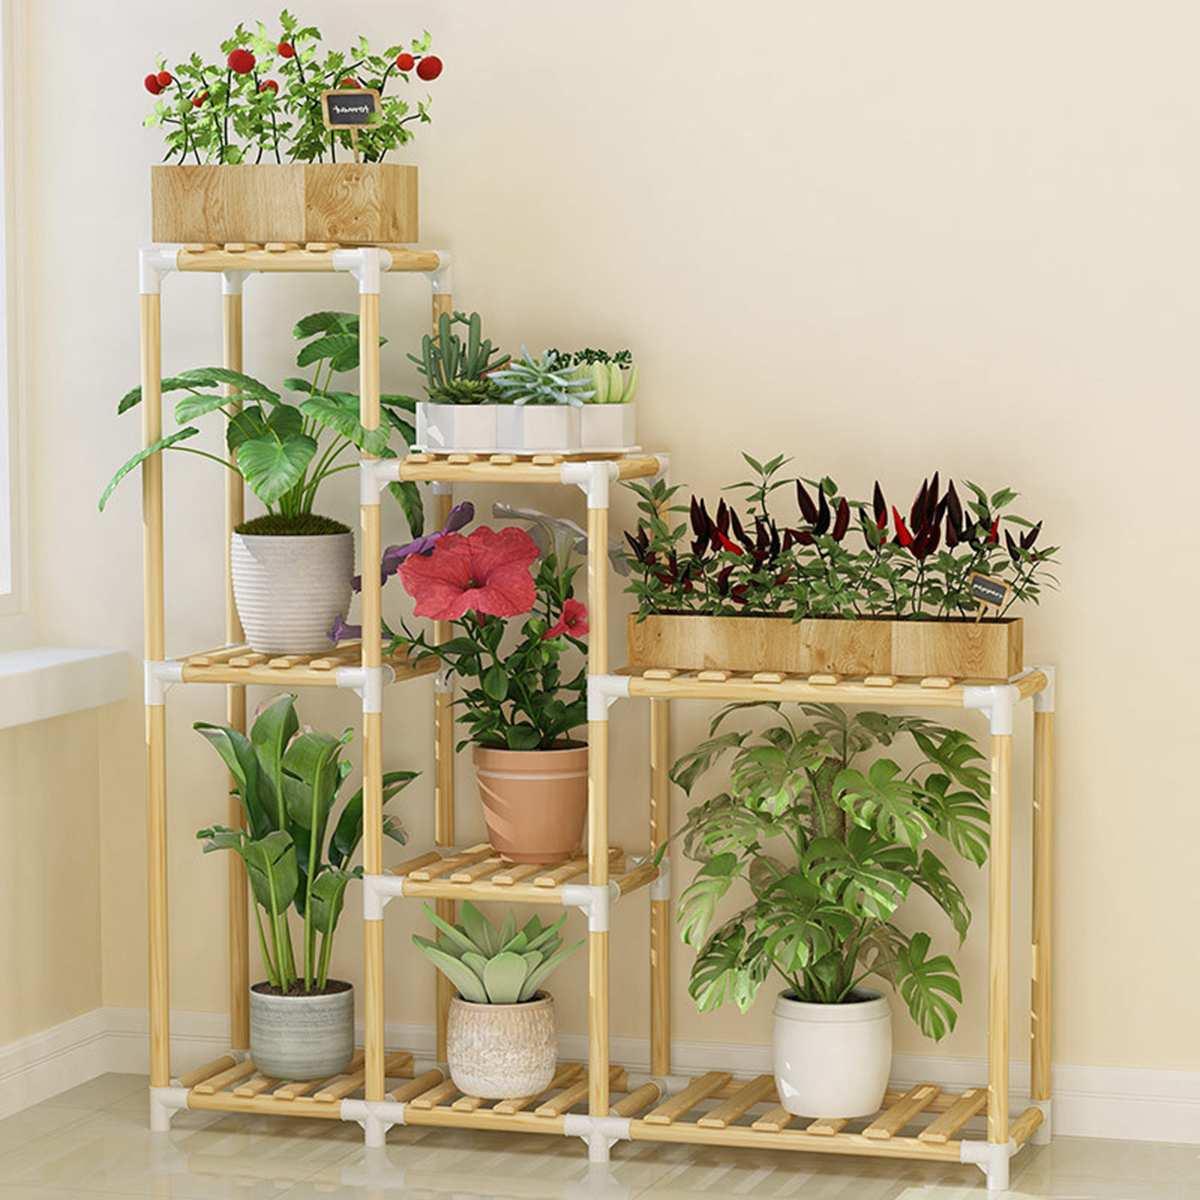 Wooden Flower Rack Plant Stand Multi-layer Flower Stand Shelves Balcony Flower Shelf Coffee Bar Indoor Garden Wood Plant Stand